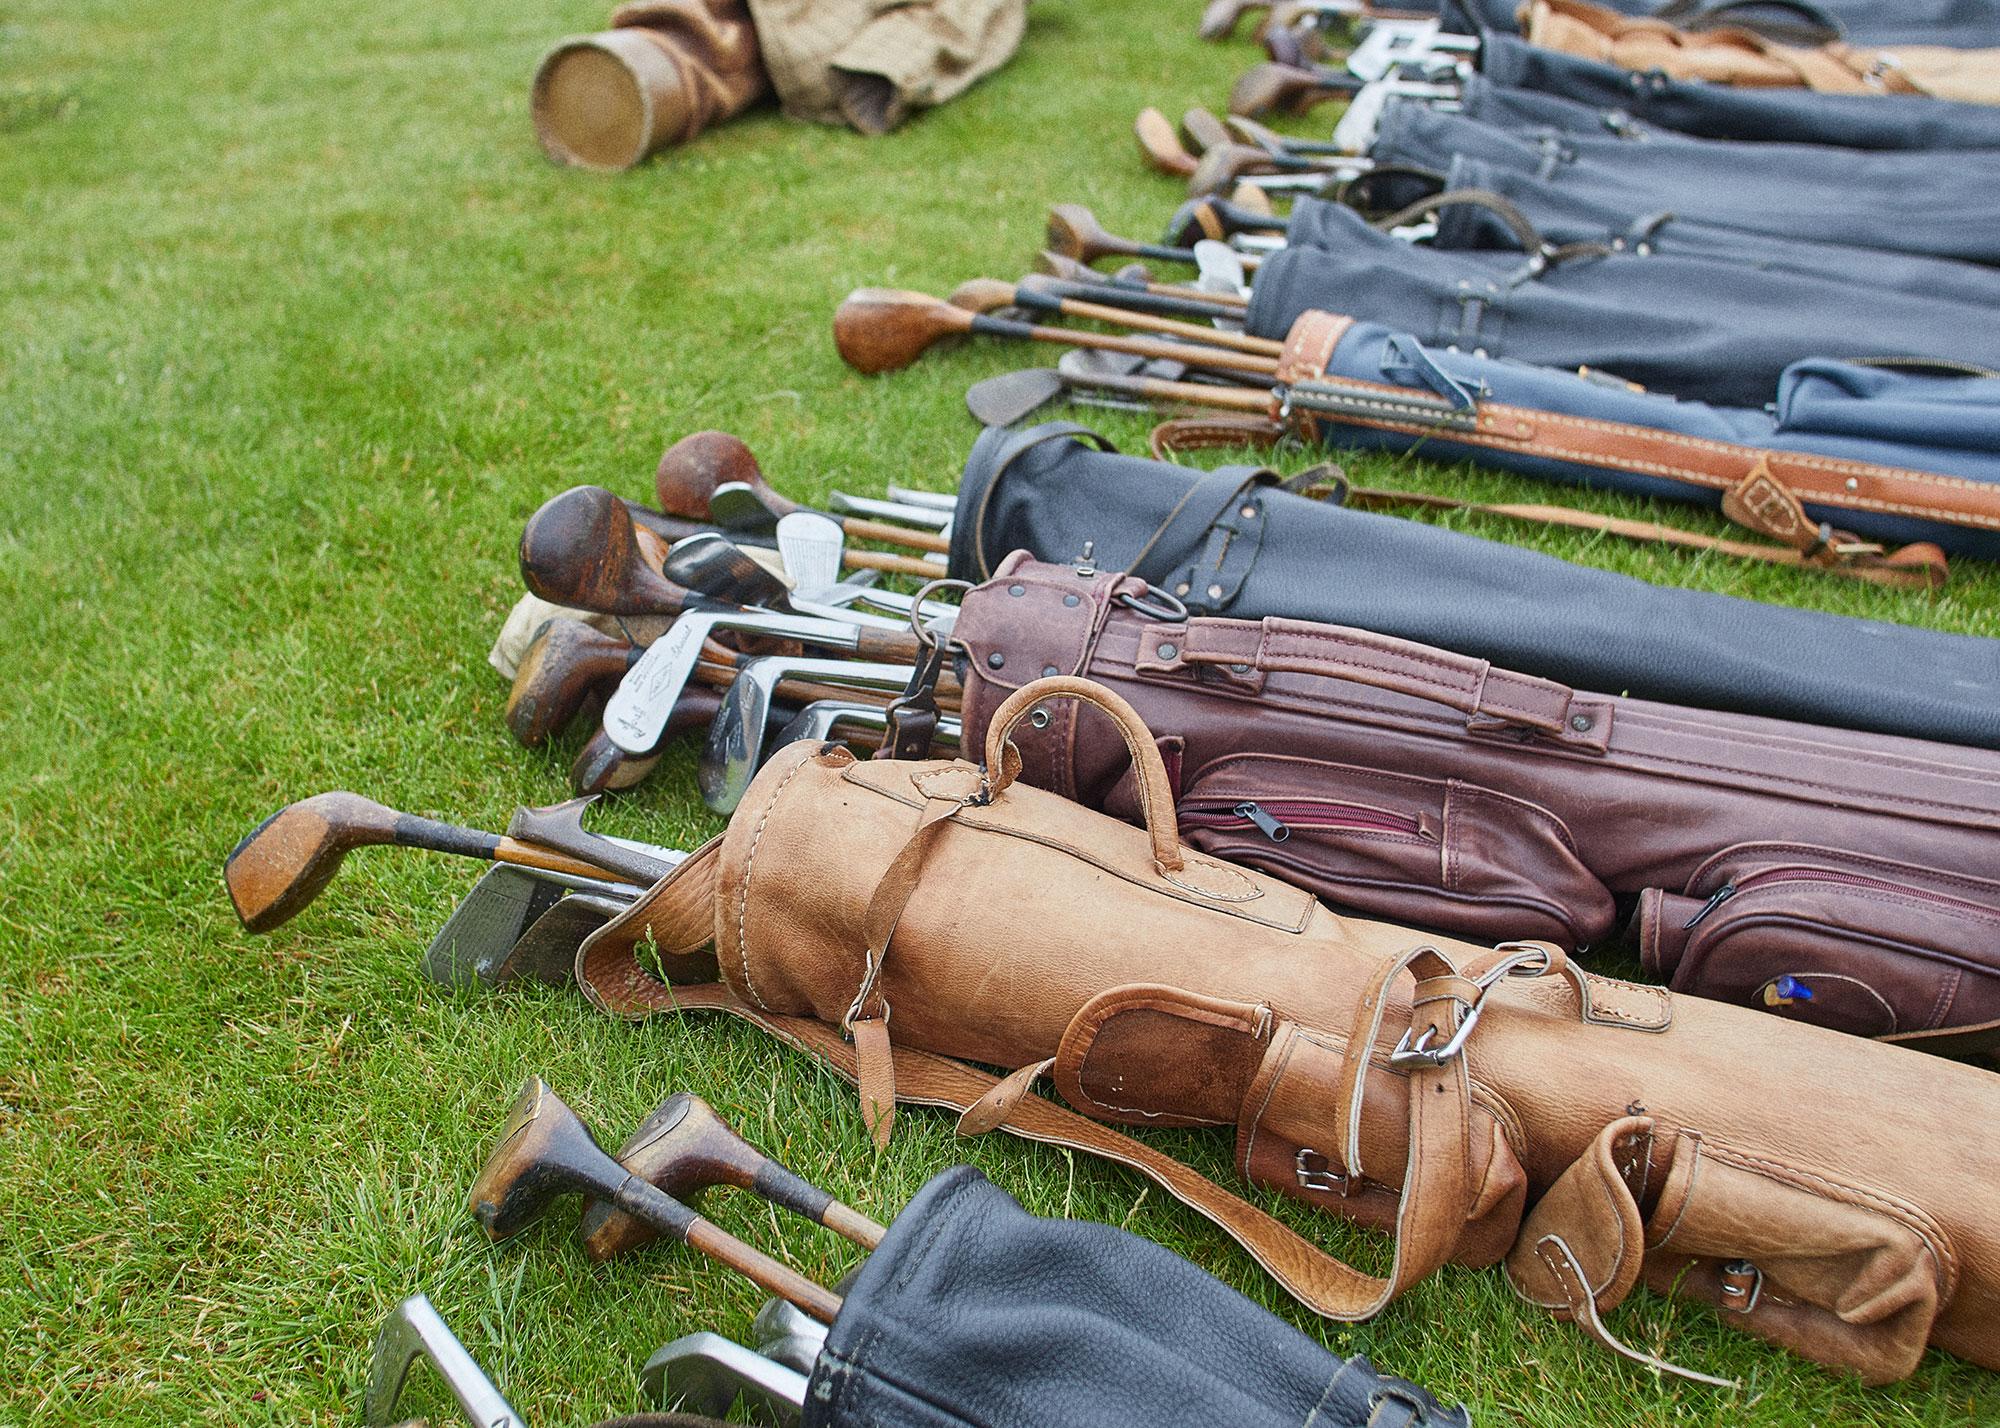 Hickory Day - Saltburn Golf Club